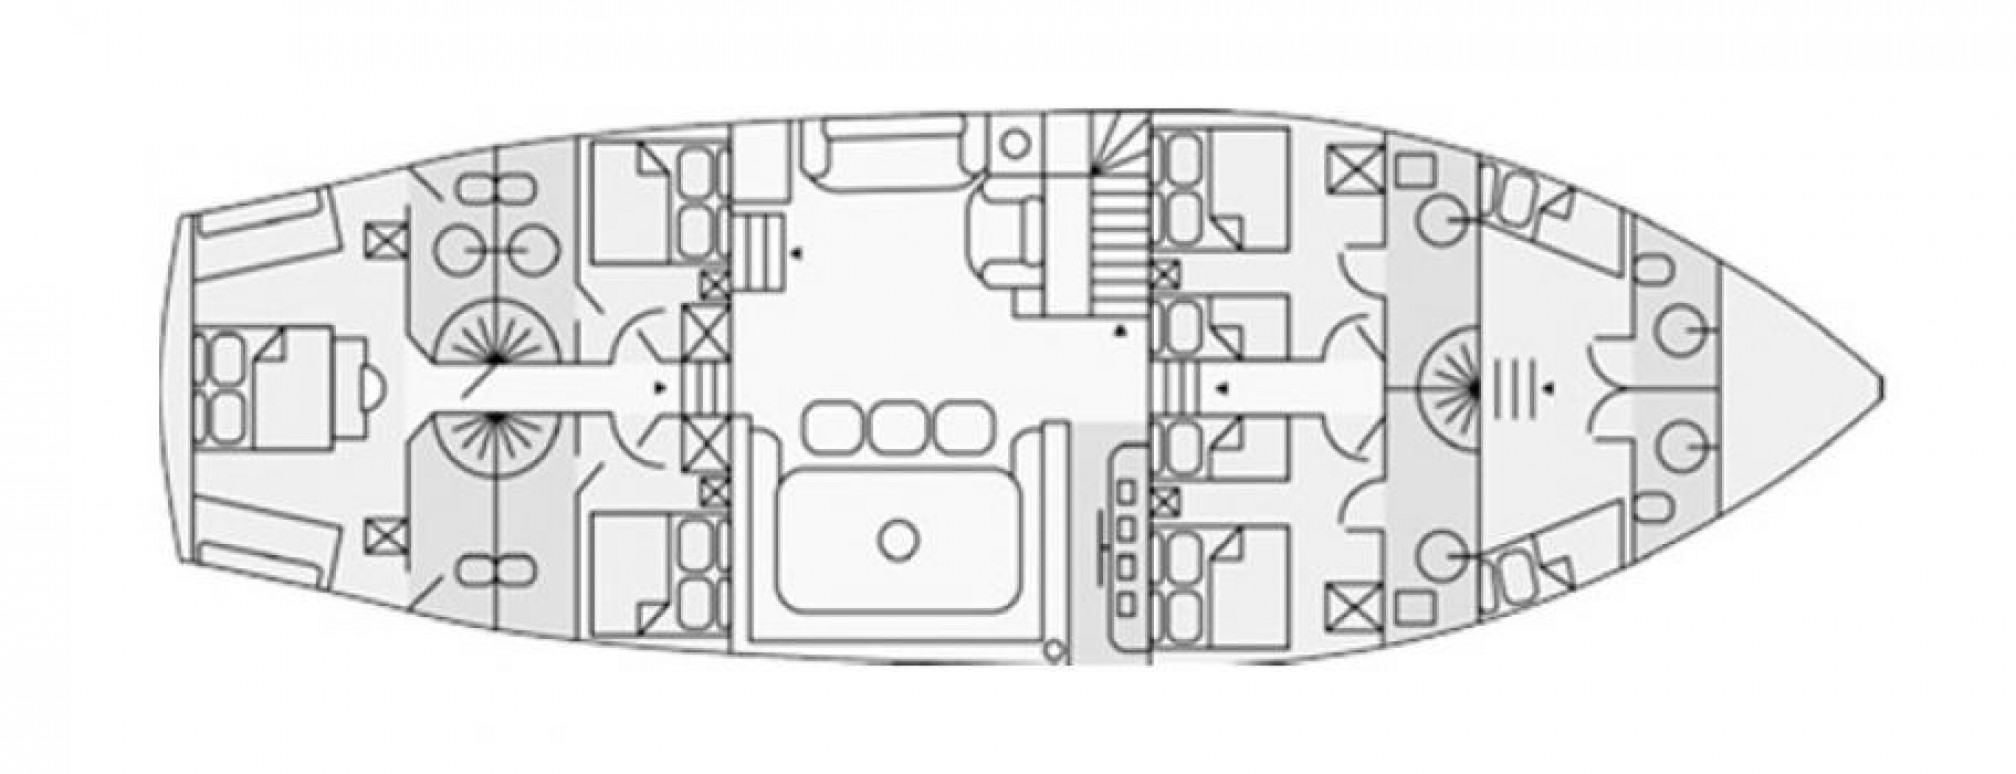 Dvi Marije gulet charter layout